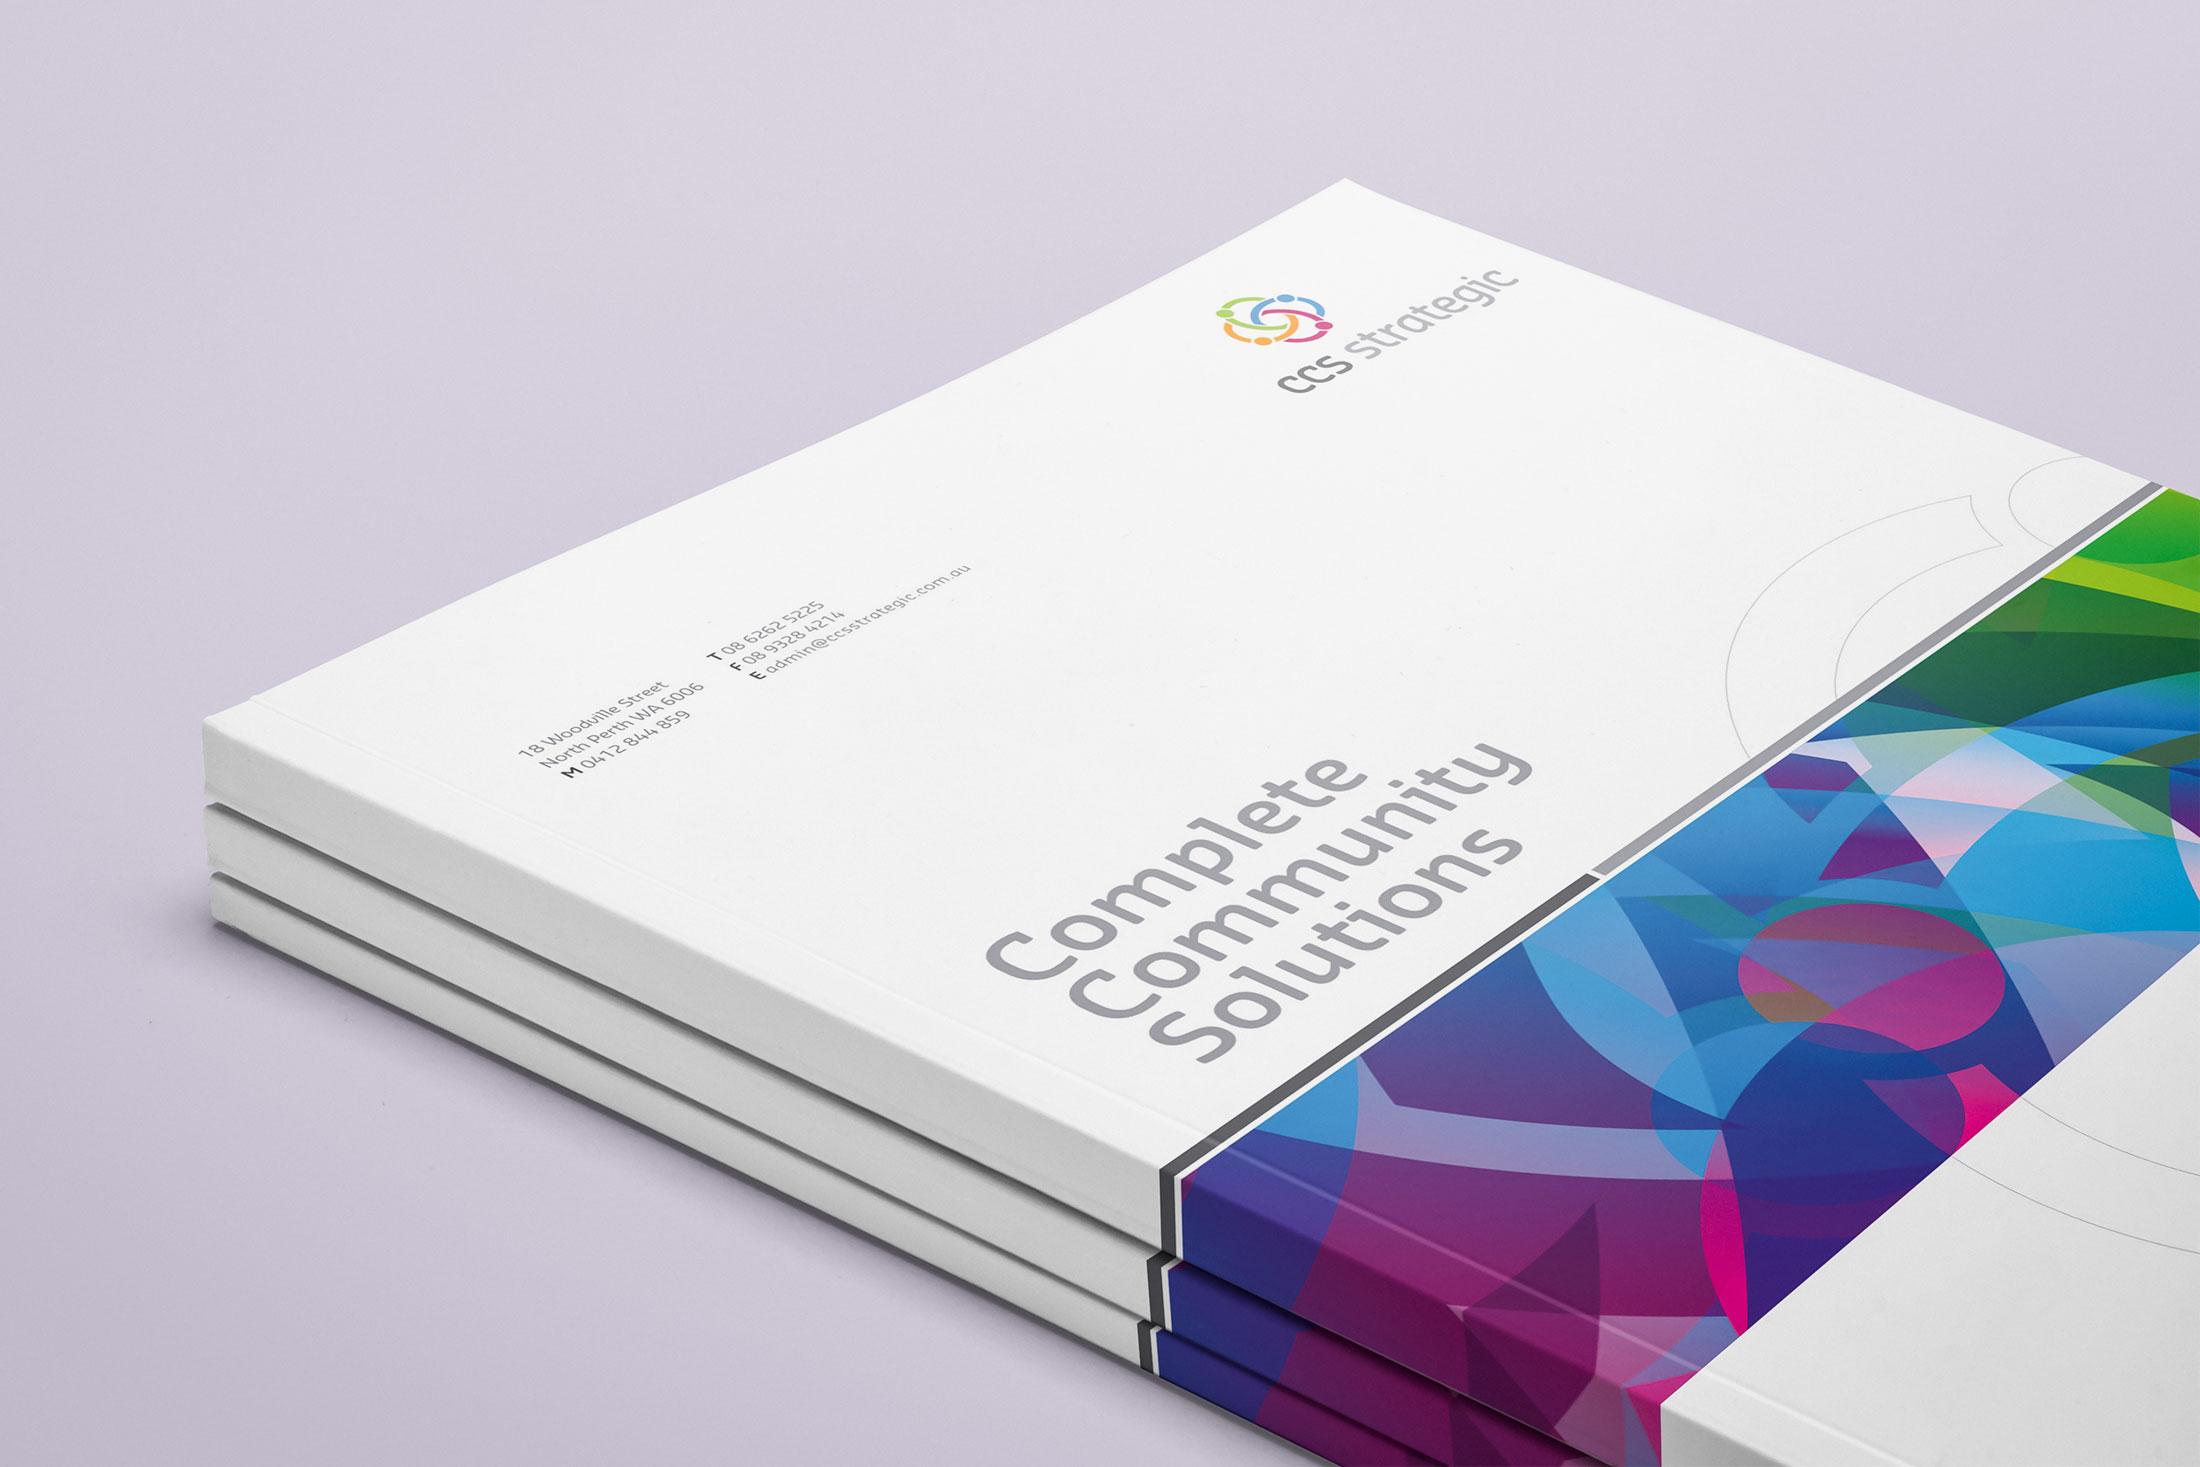 CSS Strategic Publications